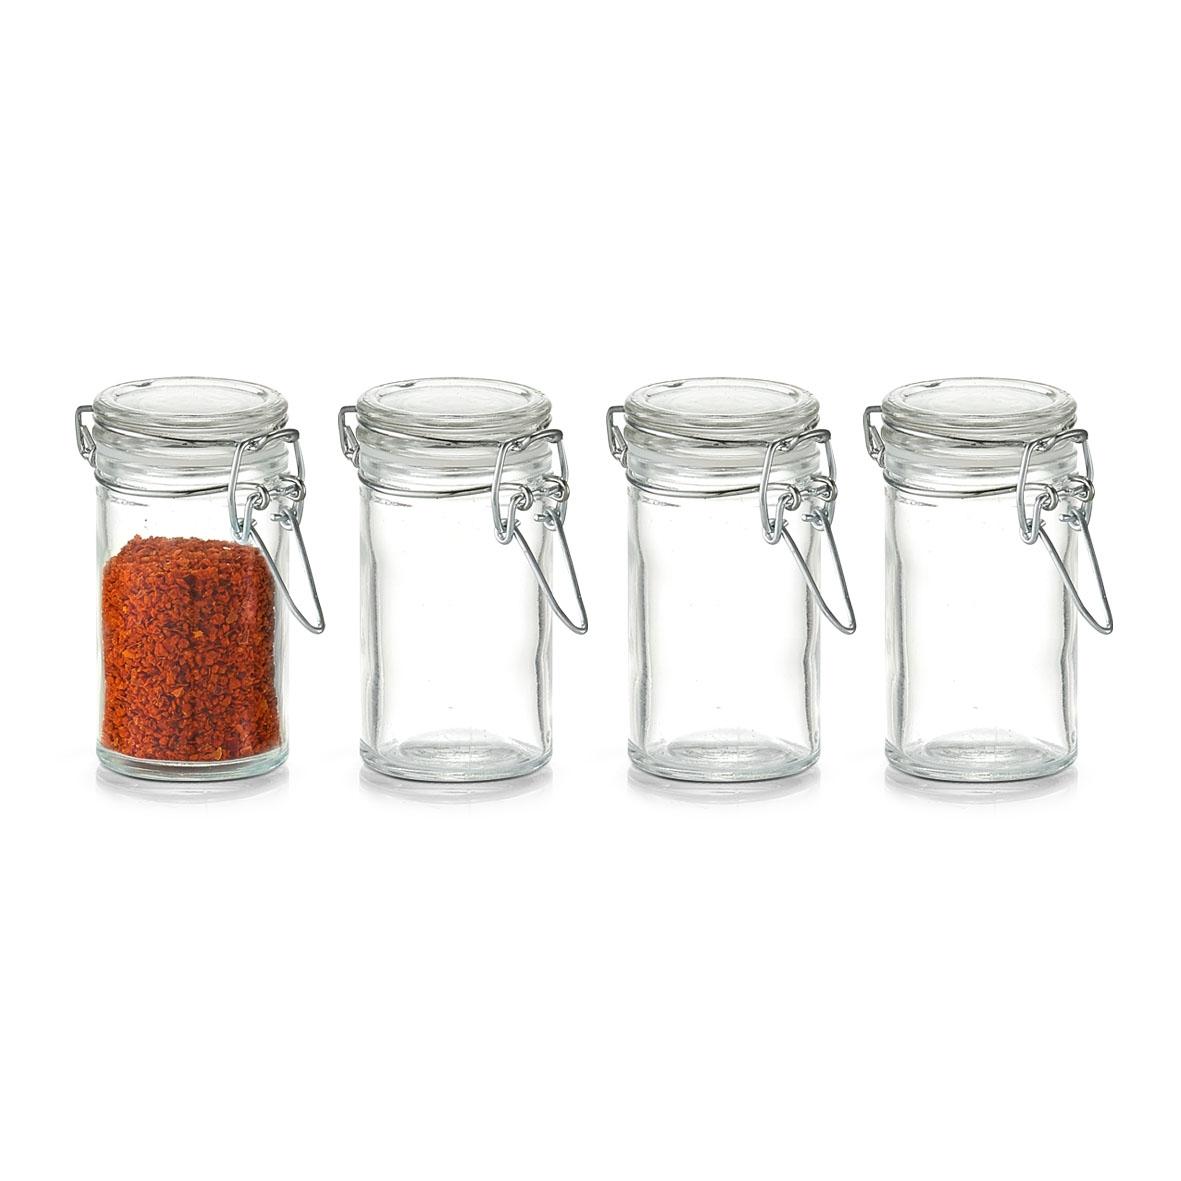 Set 4 borcane pentru depozitare Mini, inchidere ermetica, 100 ml, Ø 4,5xH8,4 cm